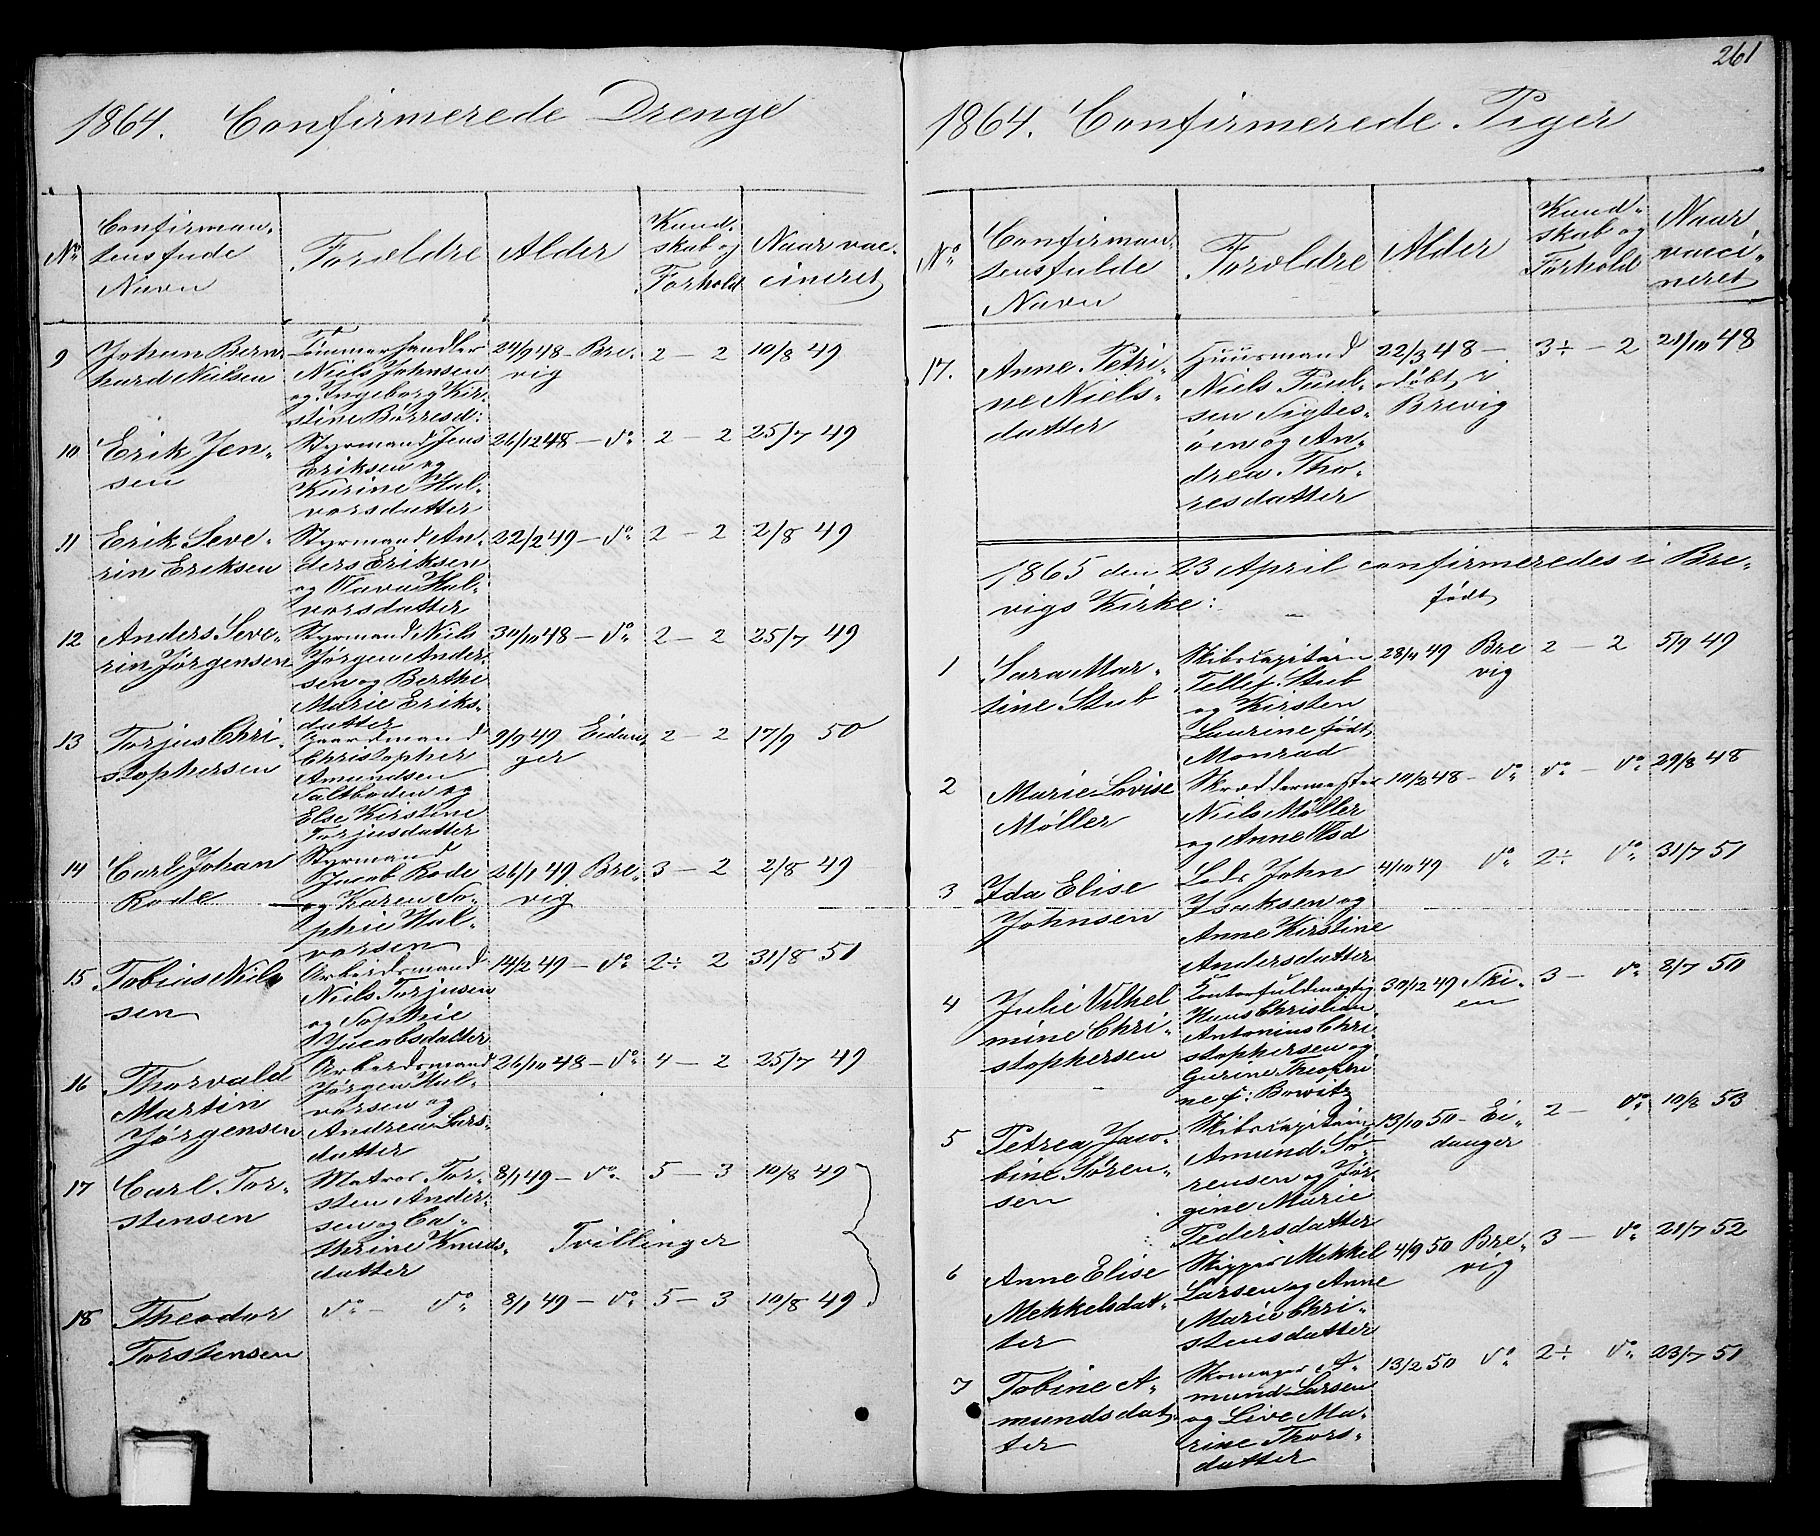 SAKO, Brevik kirkebøker, G/Ga/L0002: Klokkerbok nr. 2, 1846-1865, s. 261